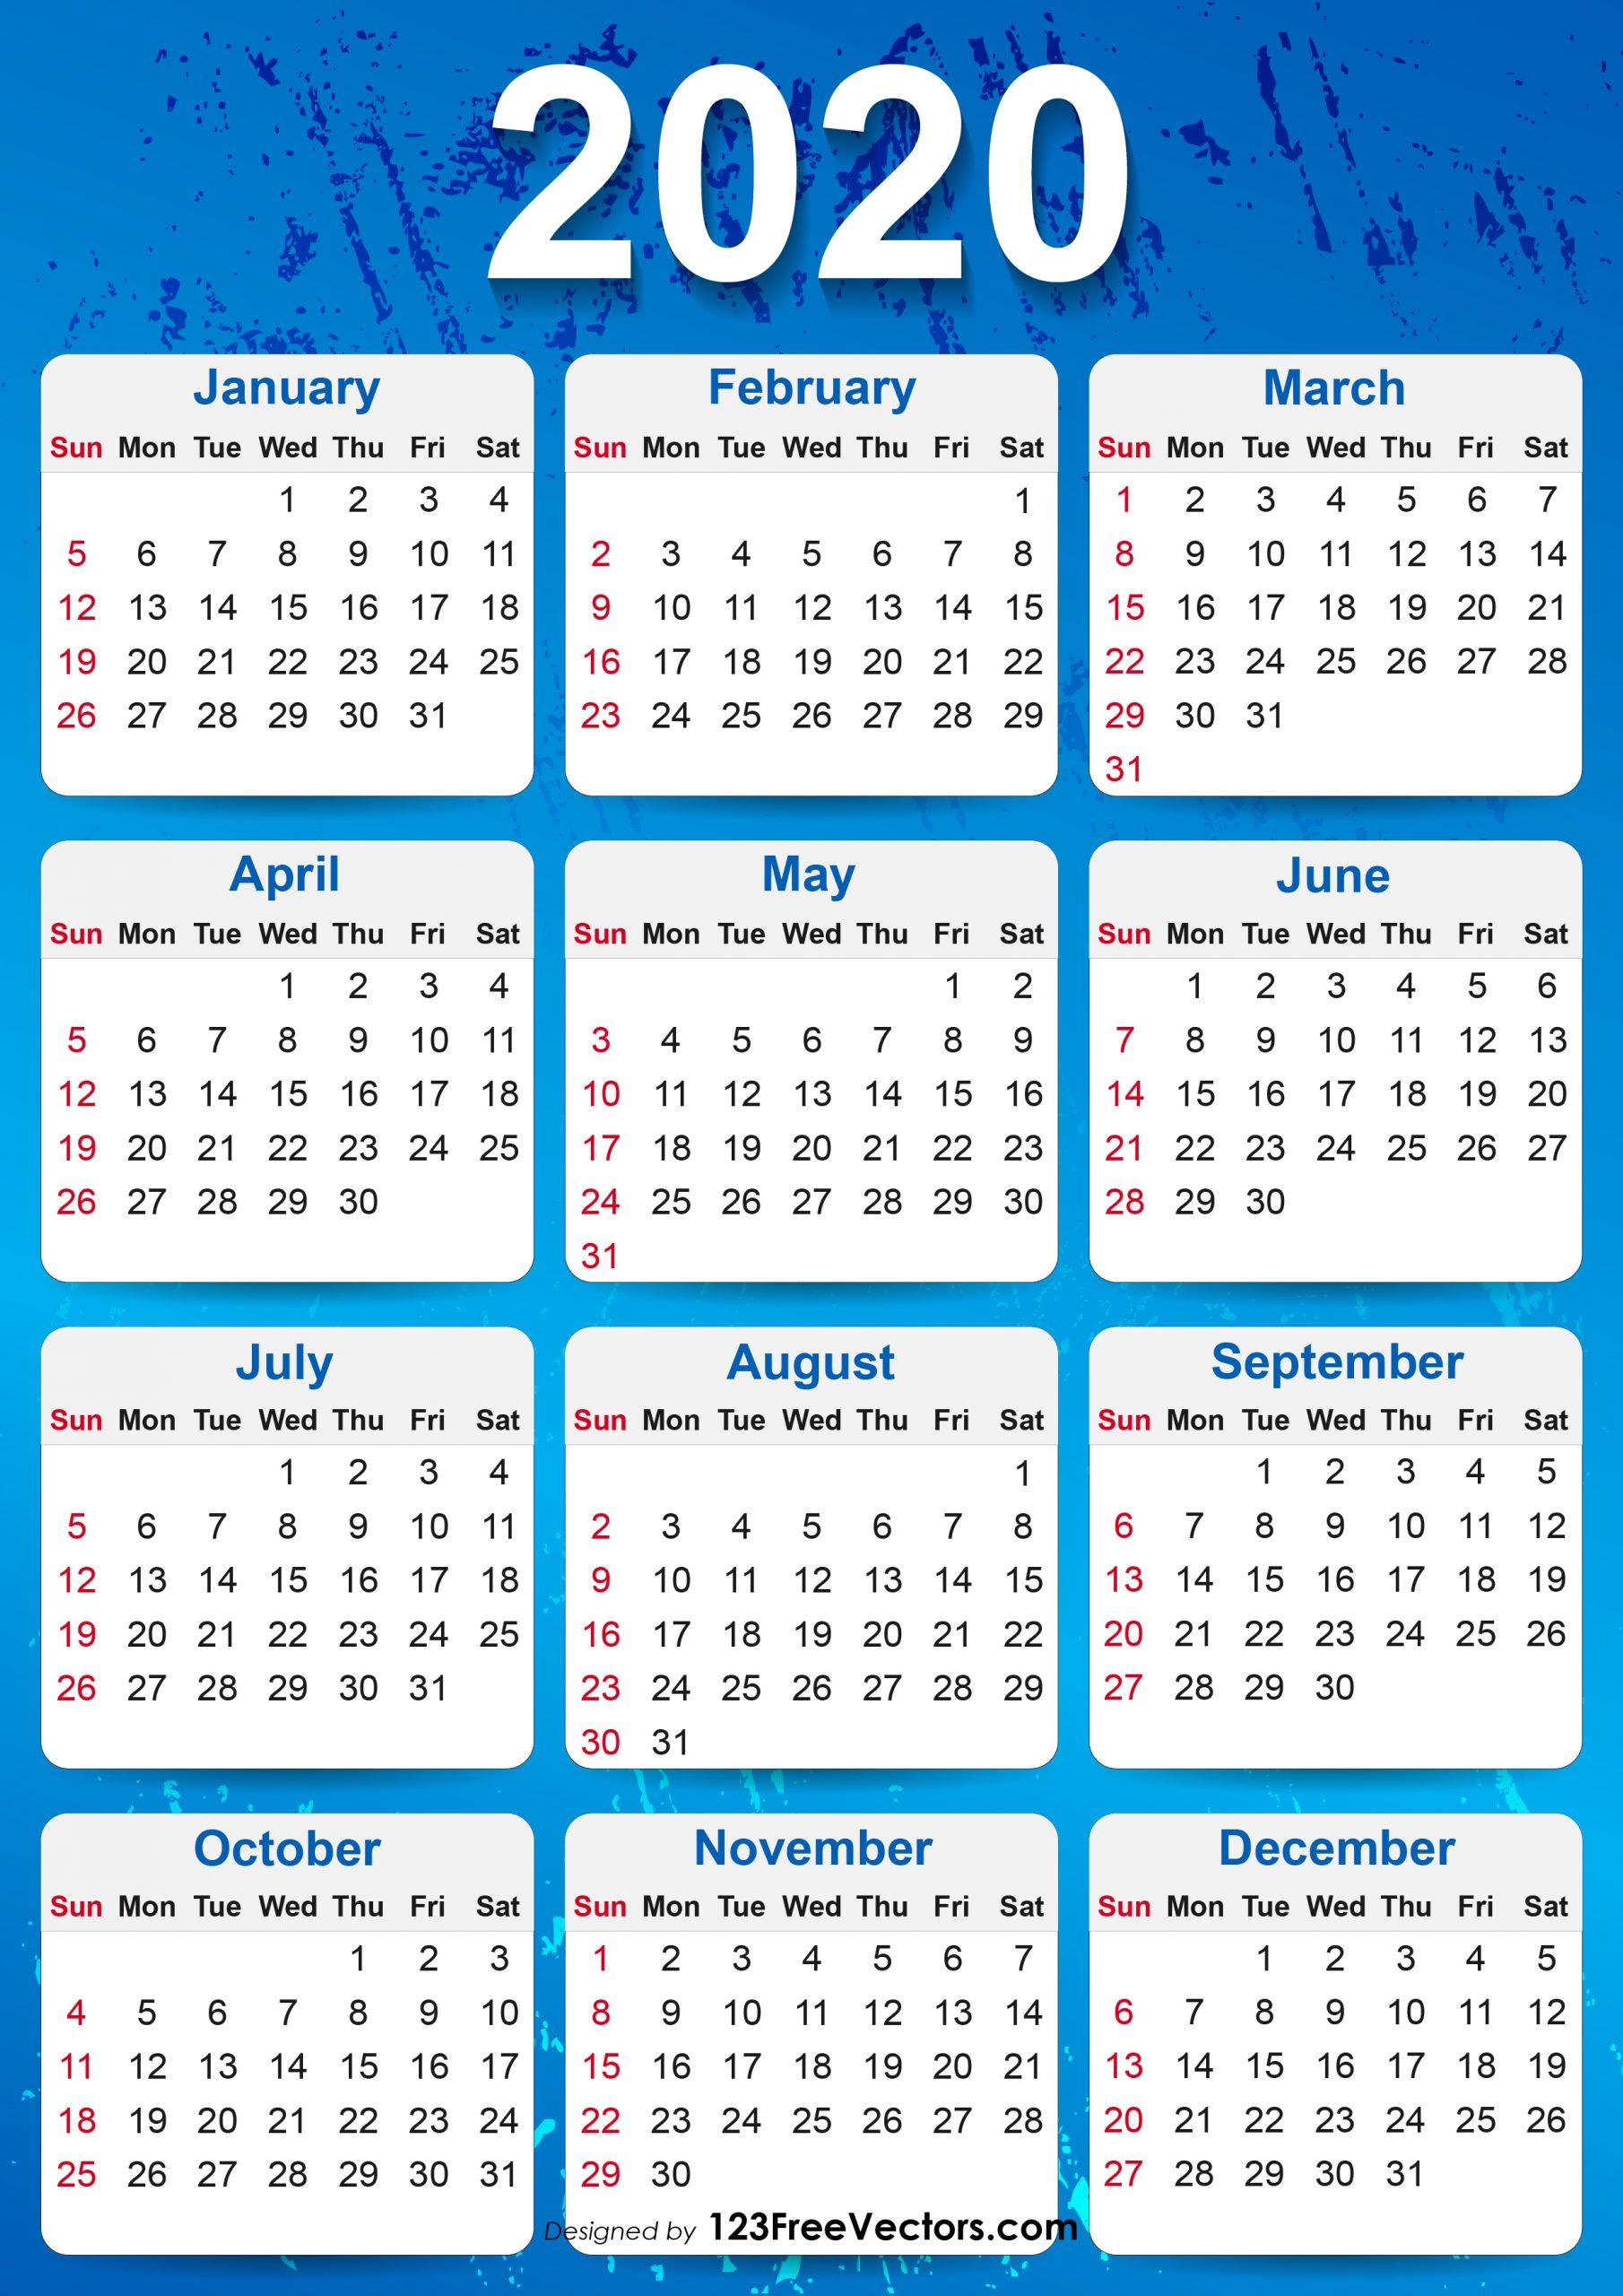 2020 Yearly Calendar Printable